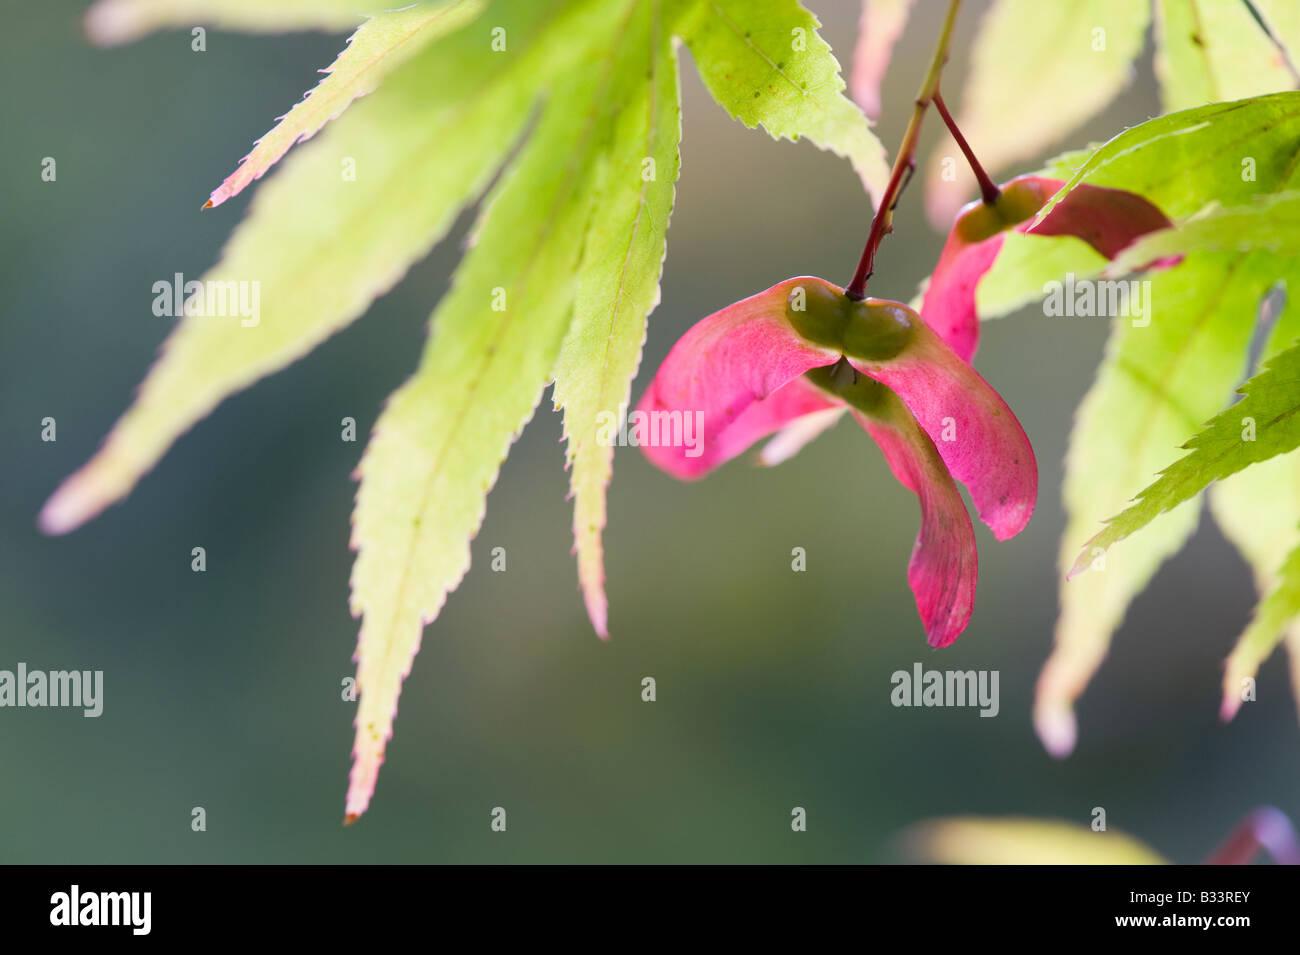 Acer Palmatum Japanese Maple Tree Seed Pods Stock Photo 19138643